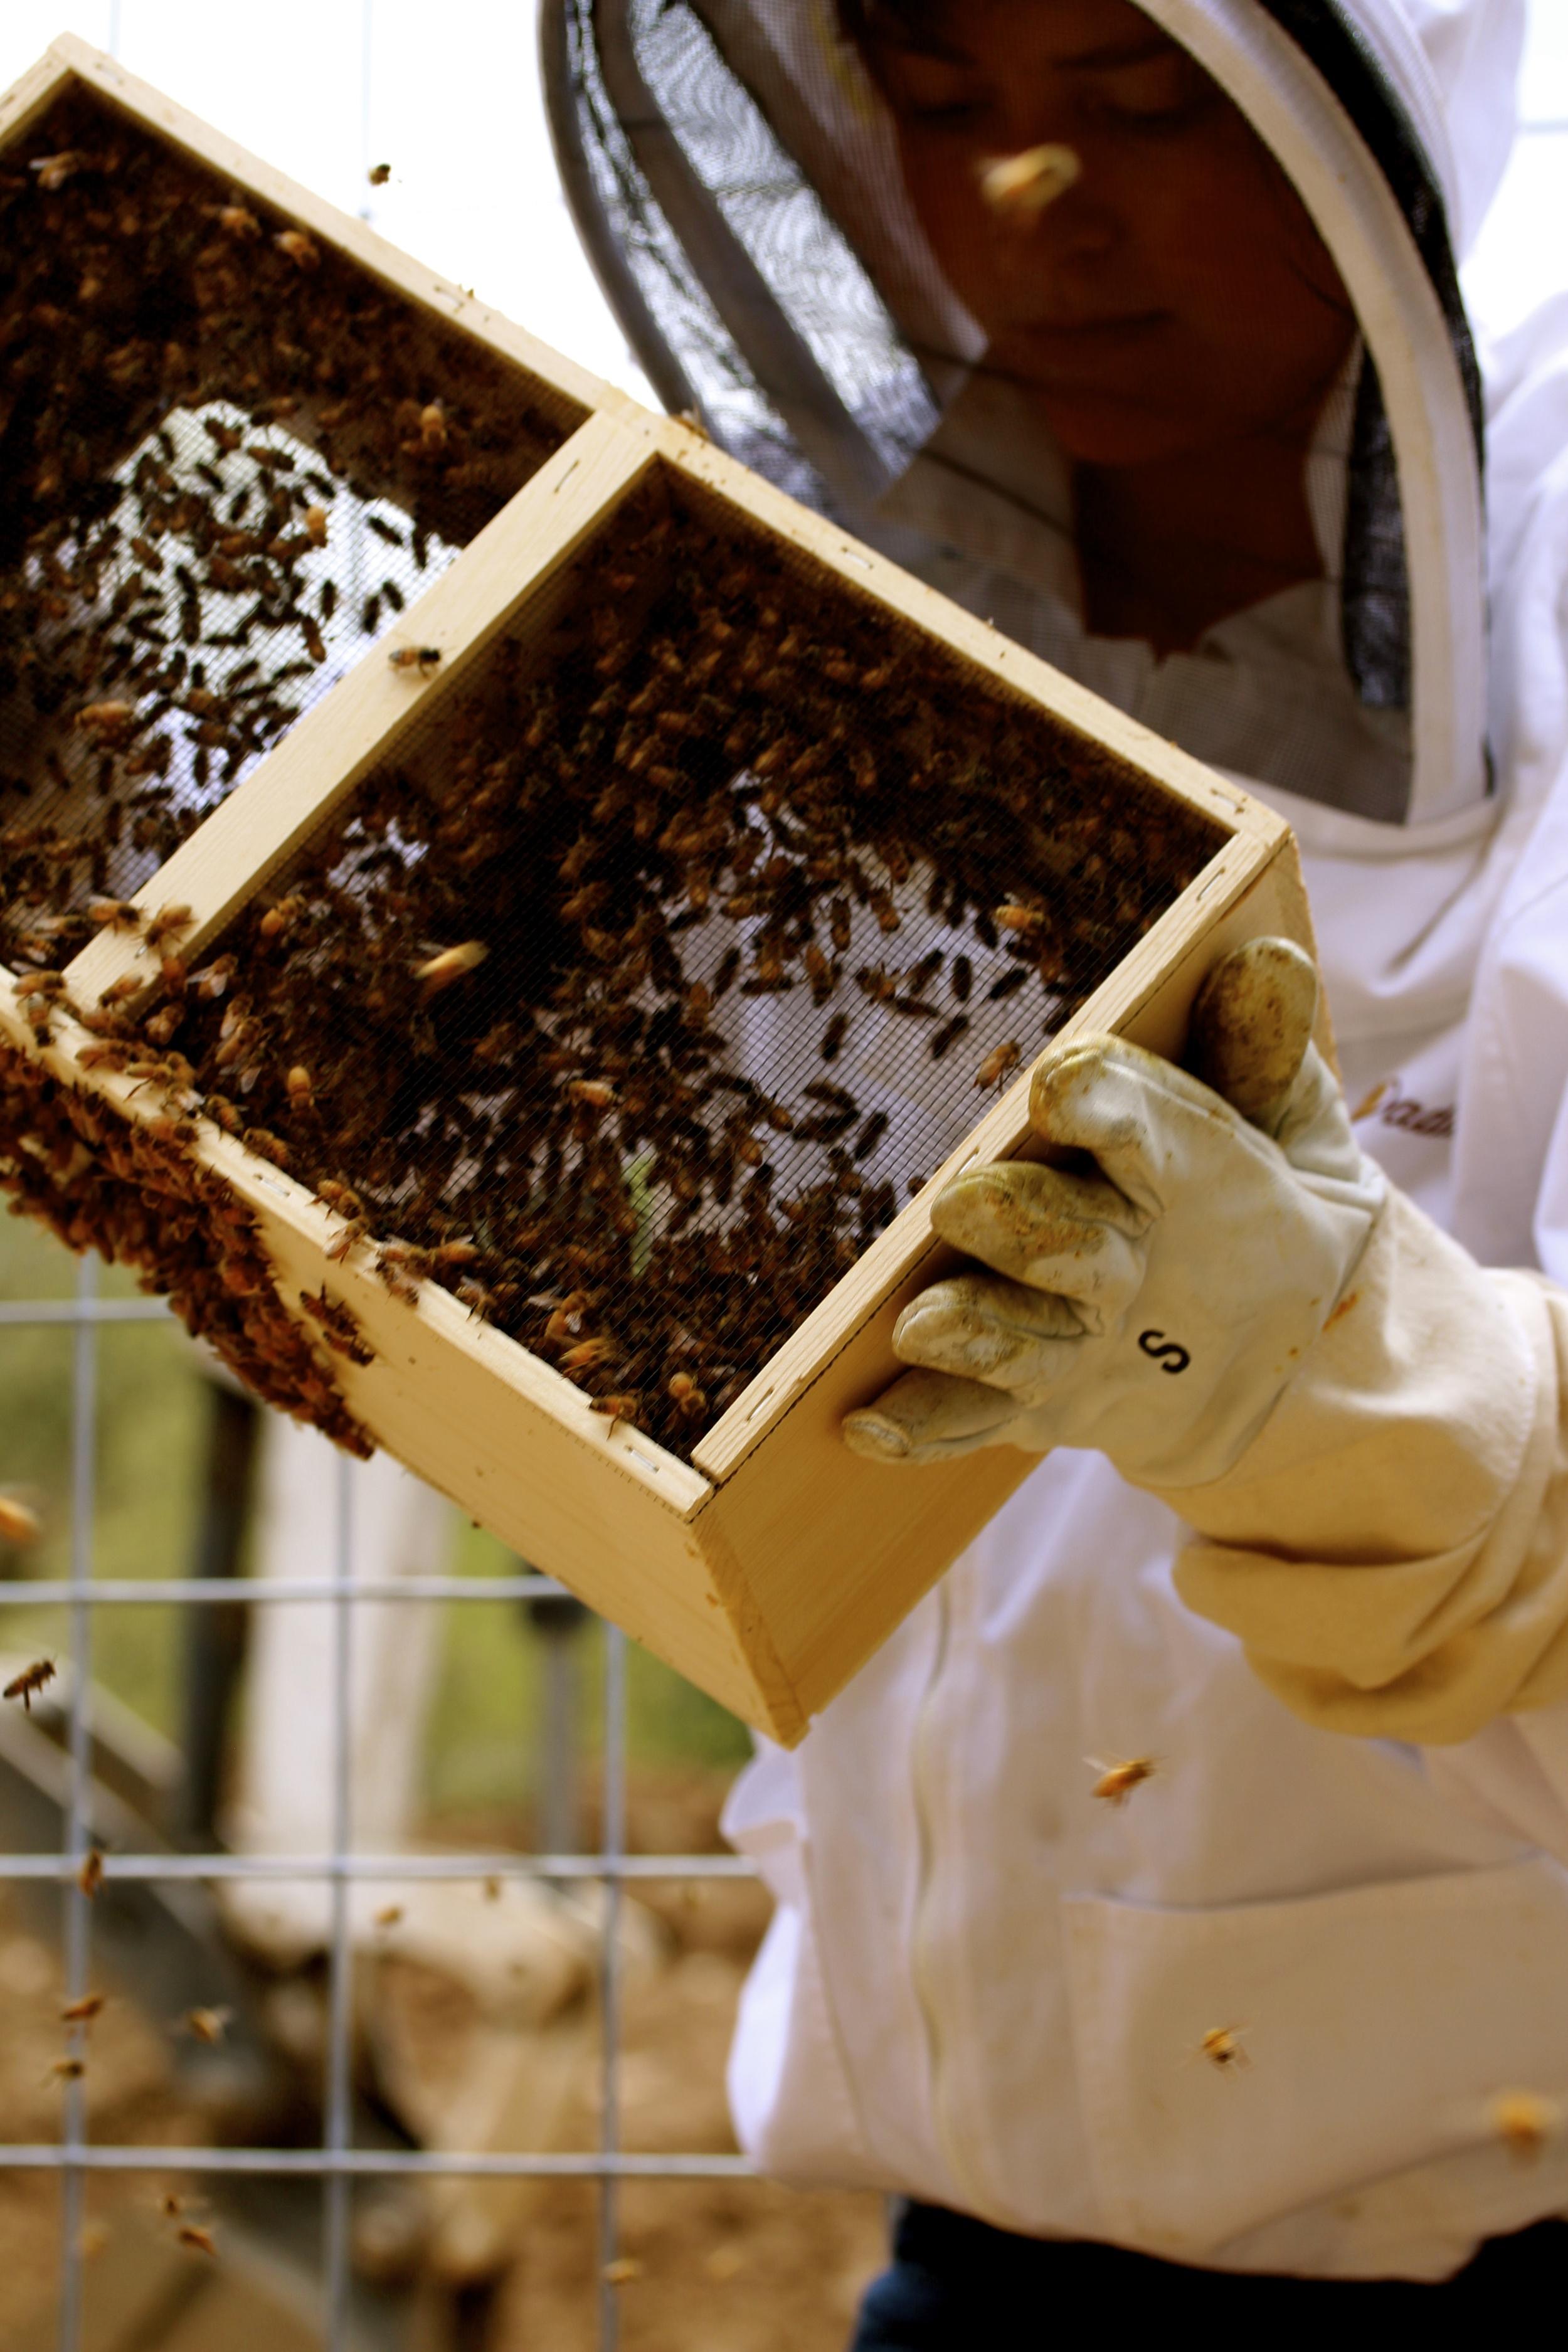 Caitlin Shaking Bees.jpg